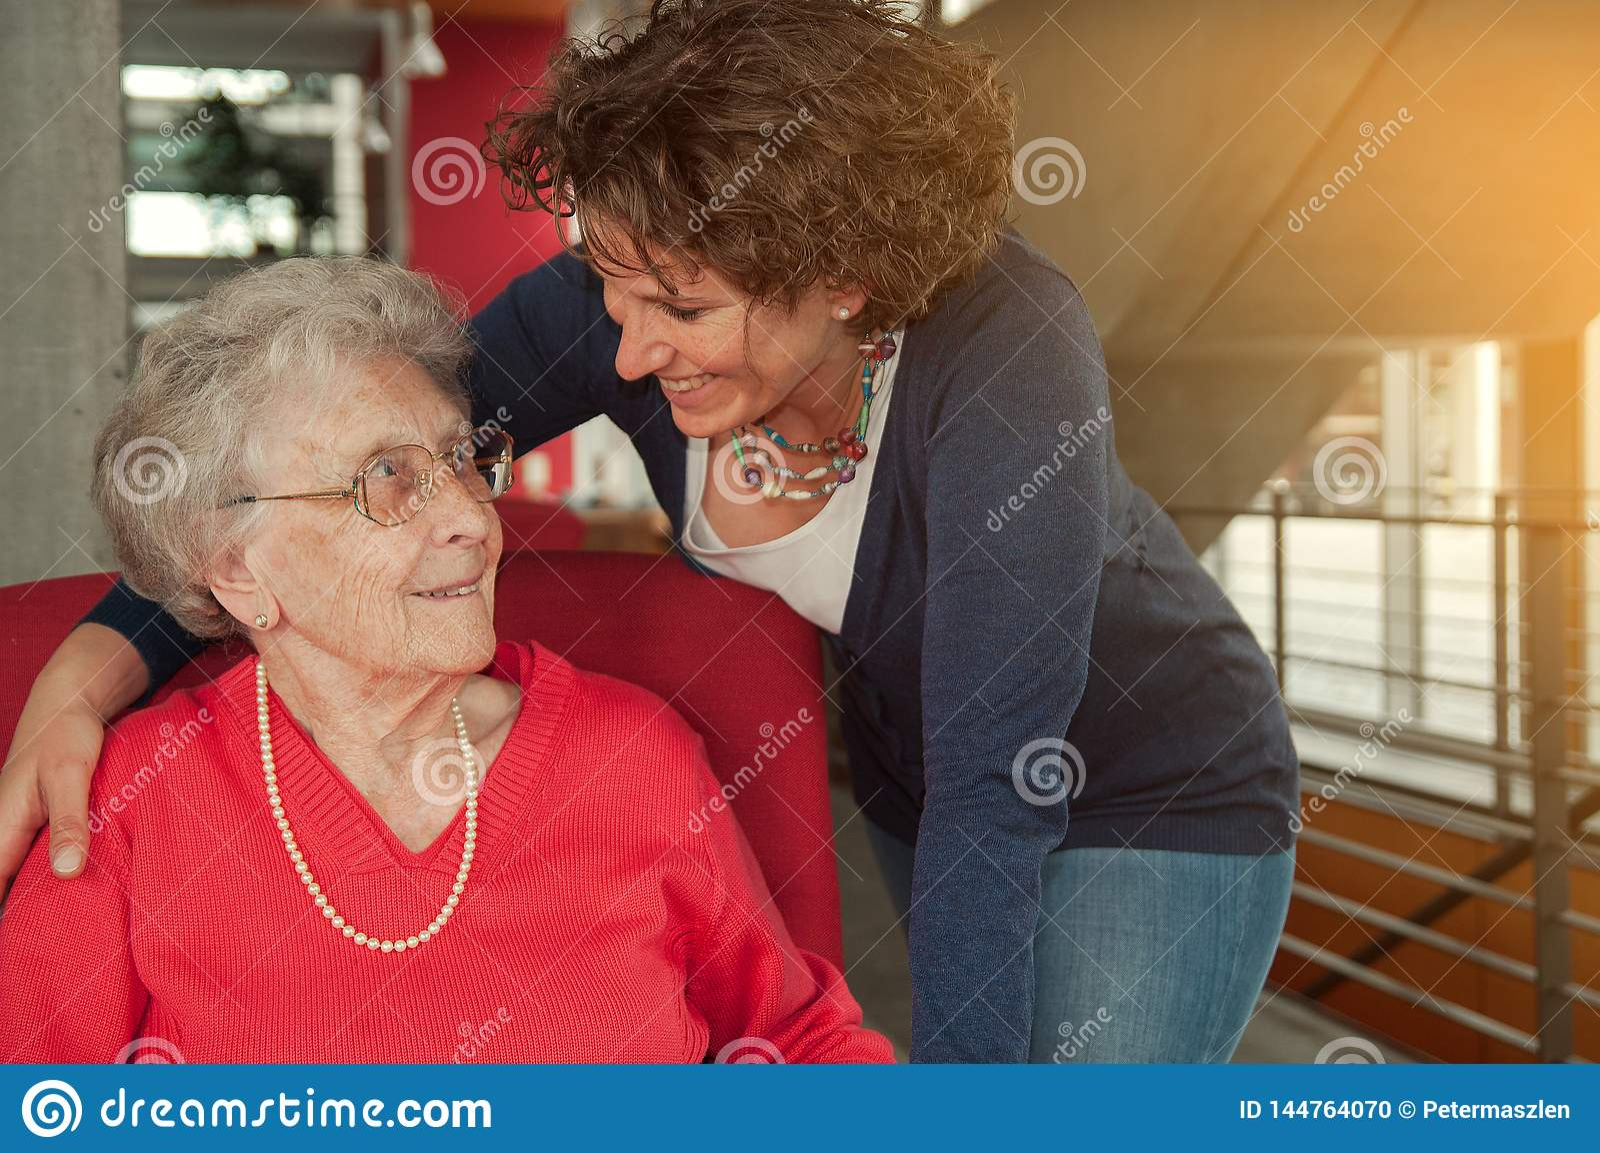 Young smiling woman embracing senior woman